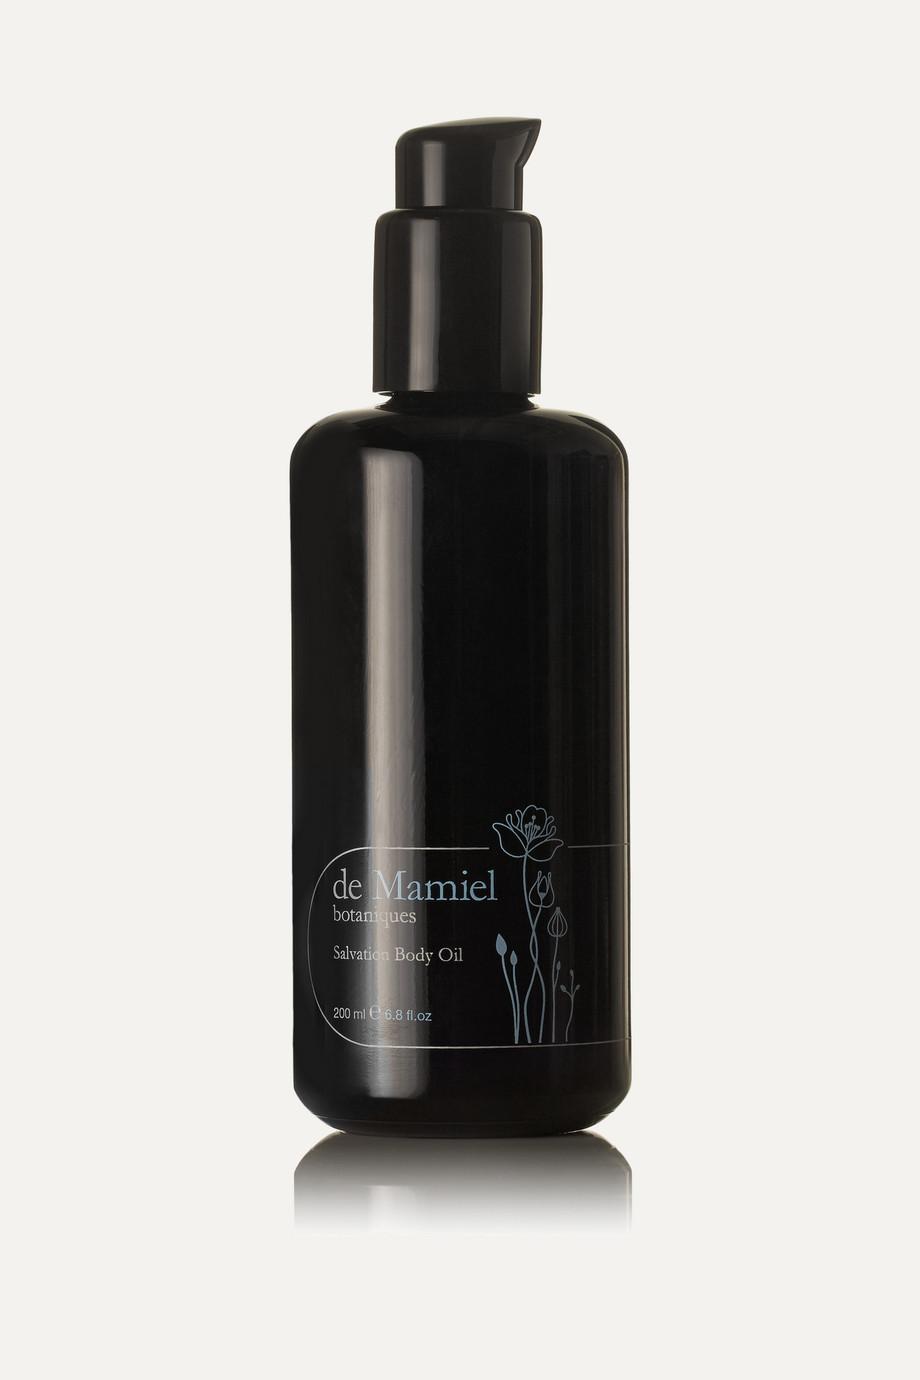 de Mamiel Salvation Body Oil, 200ml